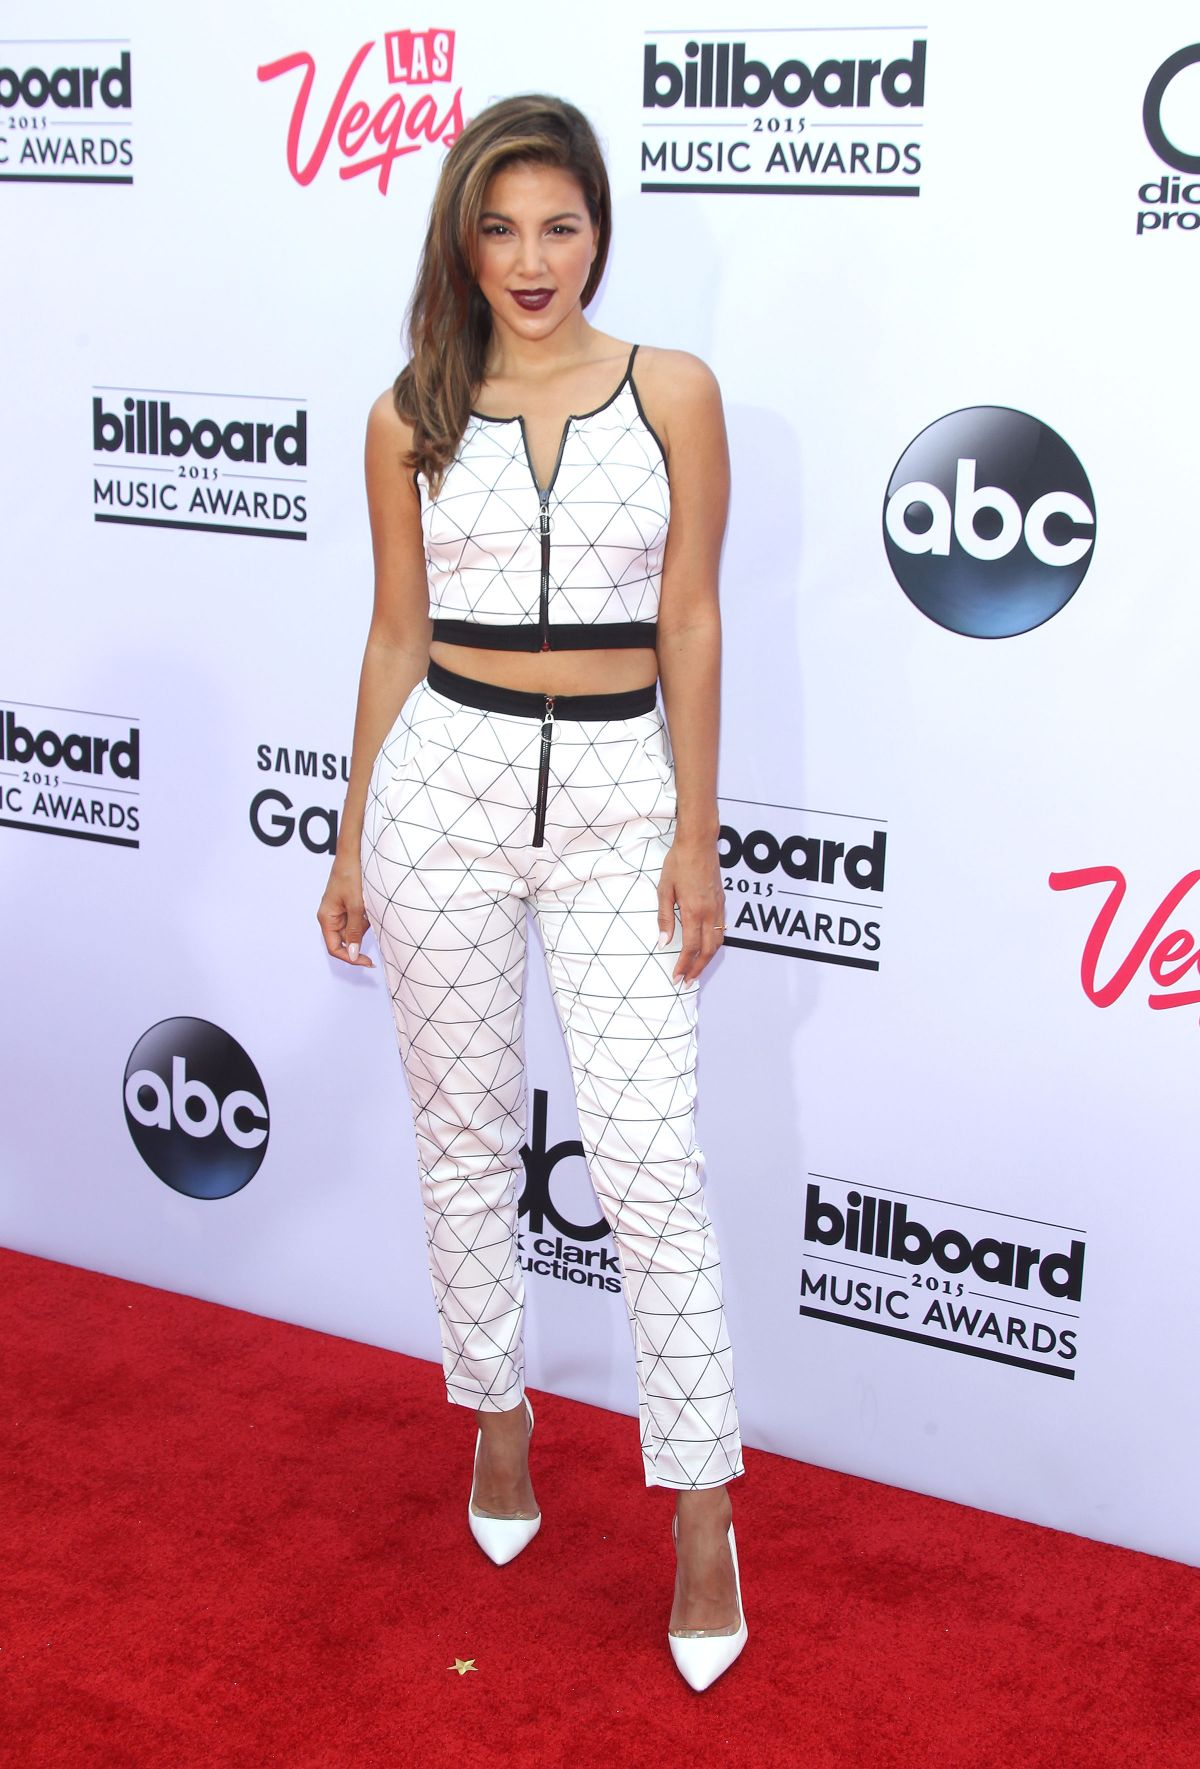 LIZ HERNANDEZ at 2015 Billboard Music Awards in Las Vegas